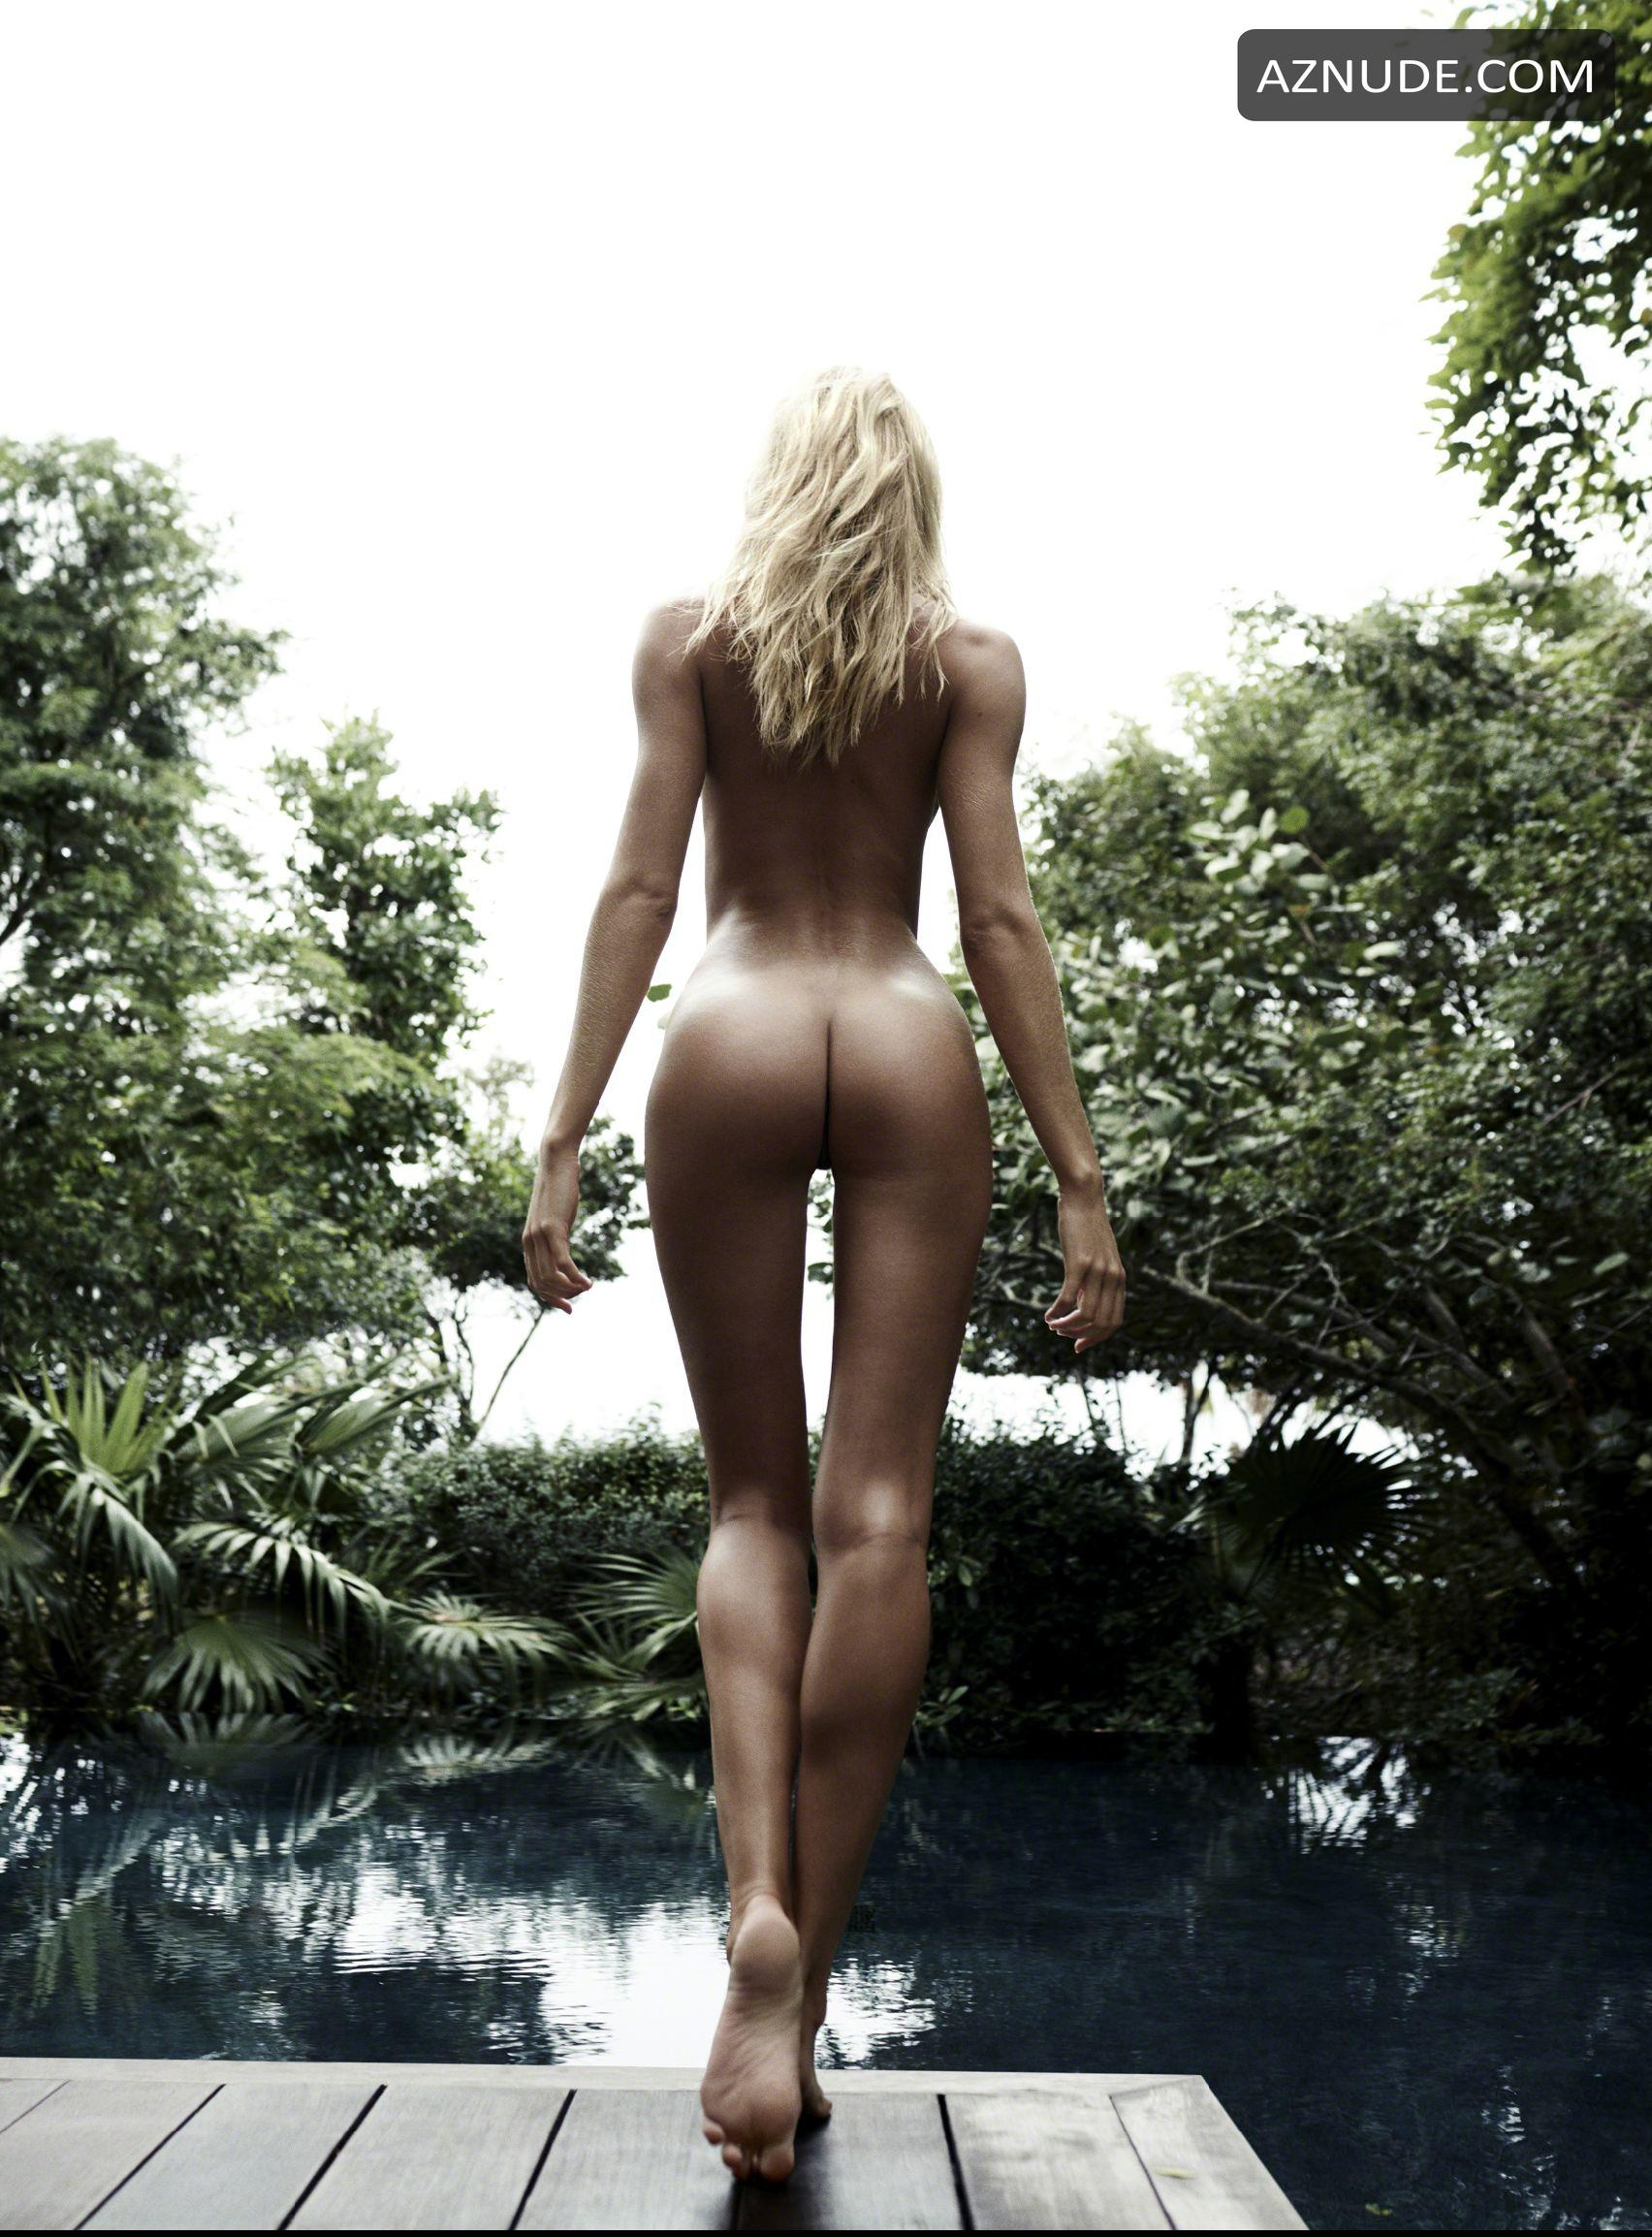 Candice naked